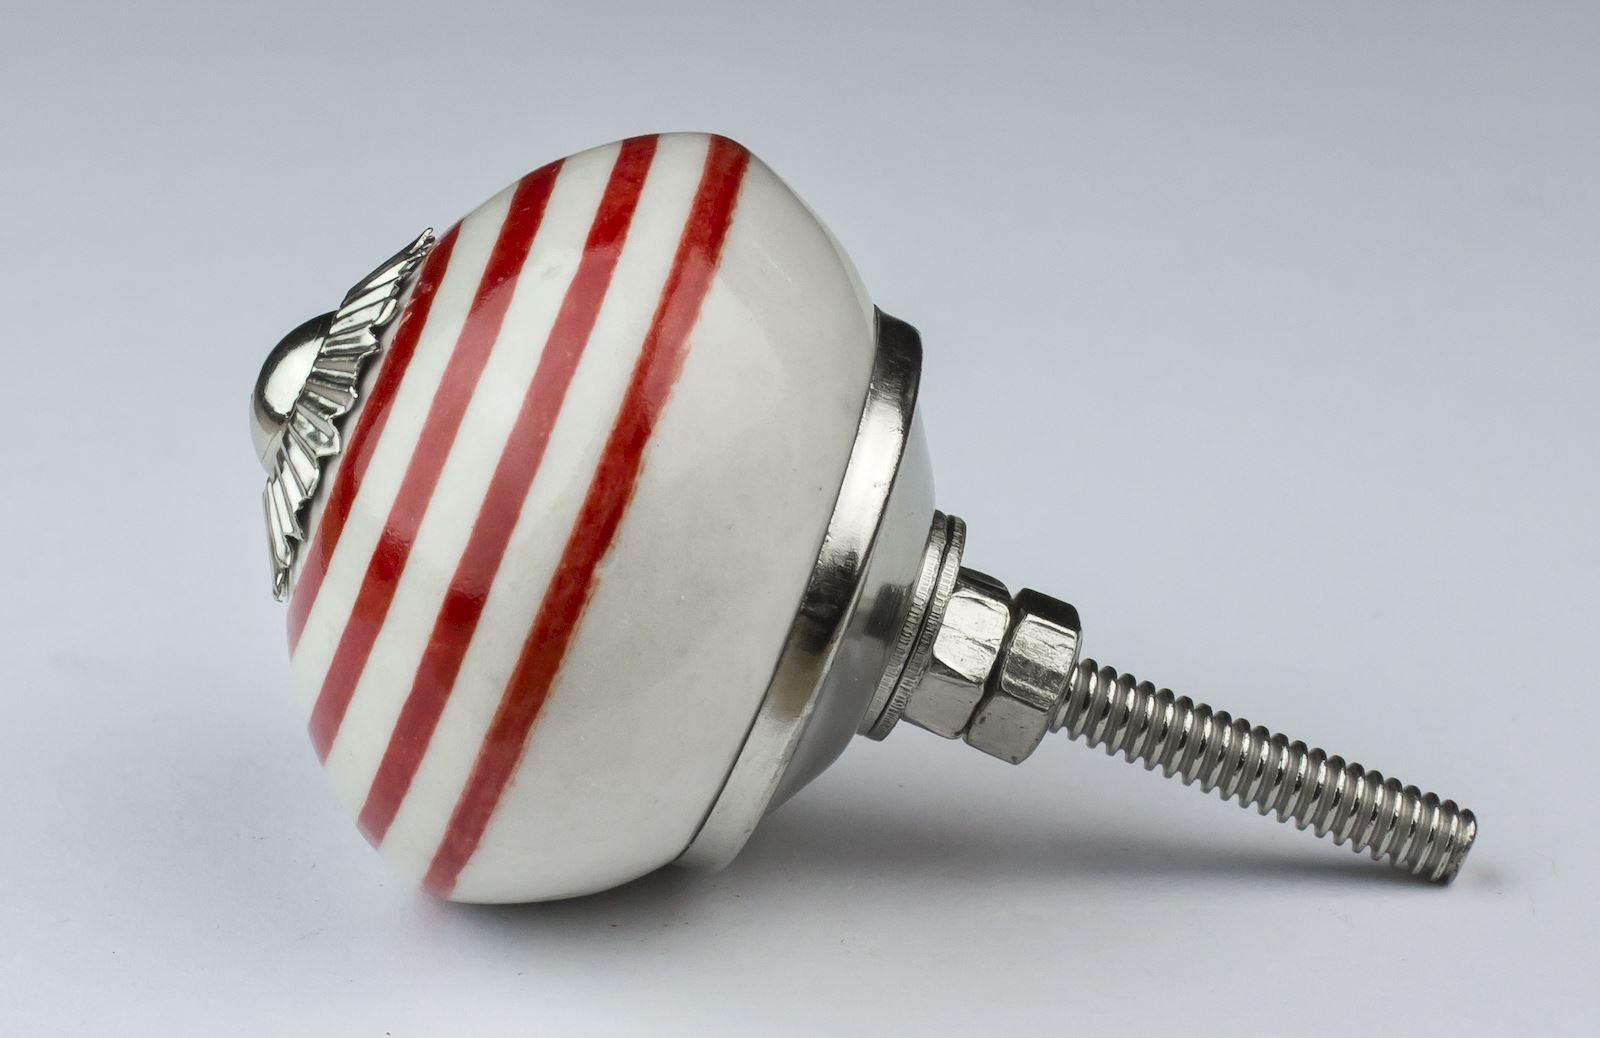 Dots-amp-Stripes-Ceramic-Door-Knobs-Handles-Furniture-Drawer-Pulls-Cupboard miniatura 57